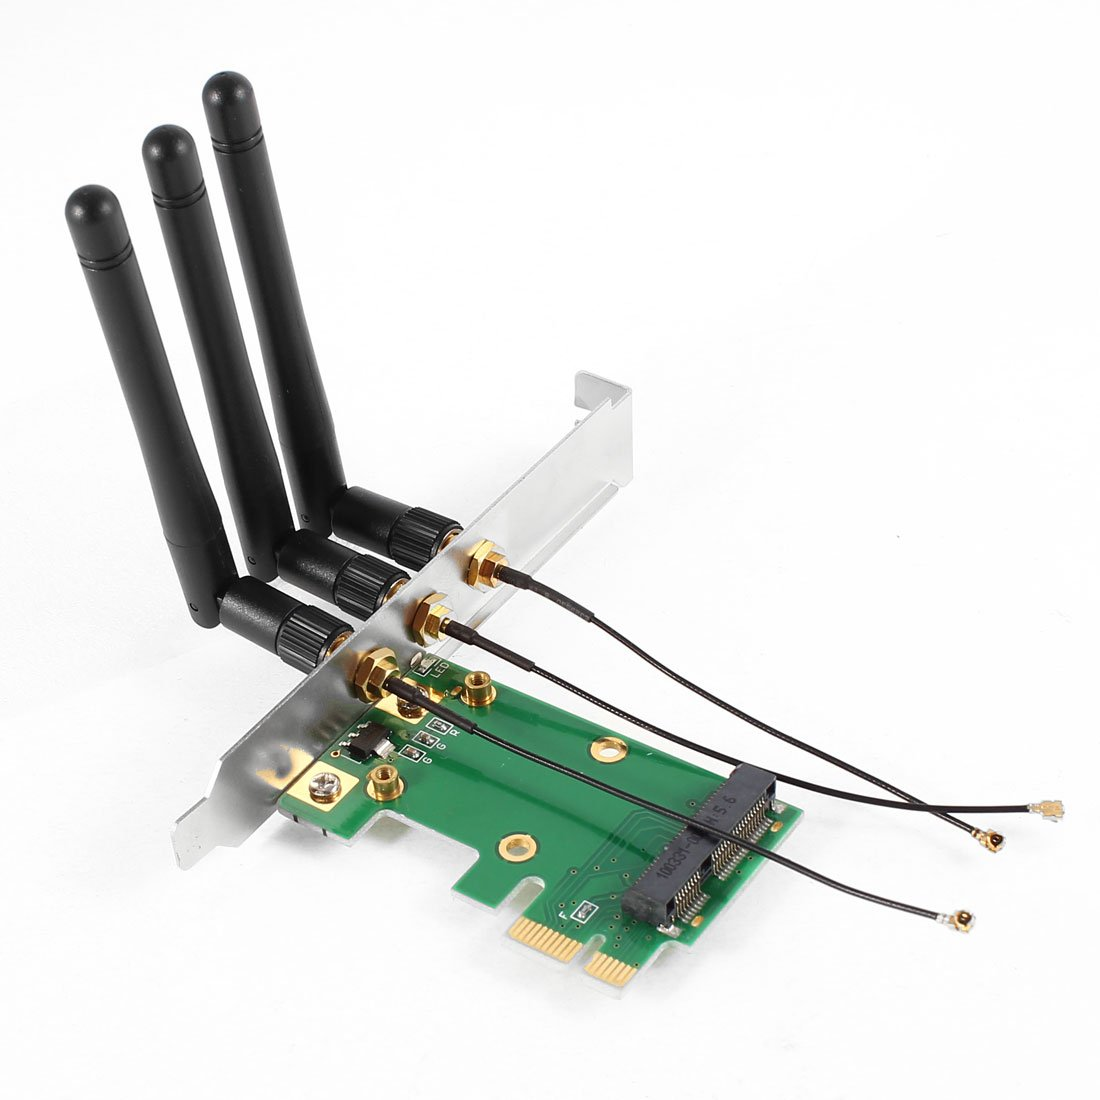 GTFS Hot Mini PCI-E Express to PCI-E Wireless Adapter w 3 Antenna WiFi for PC